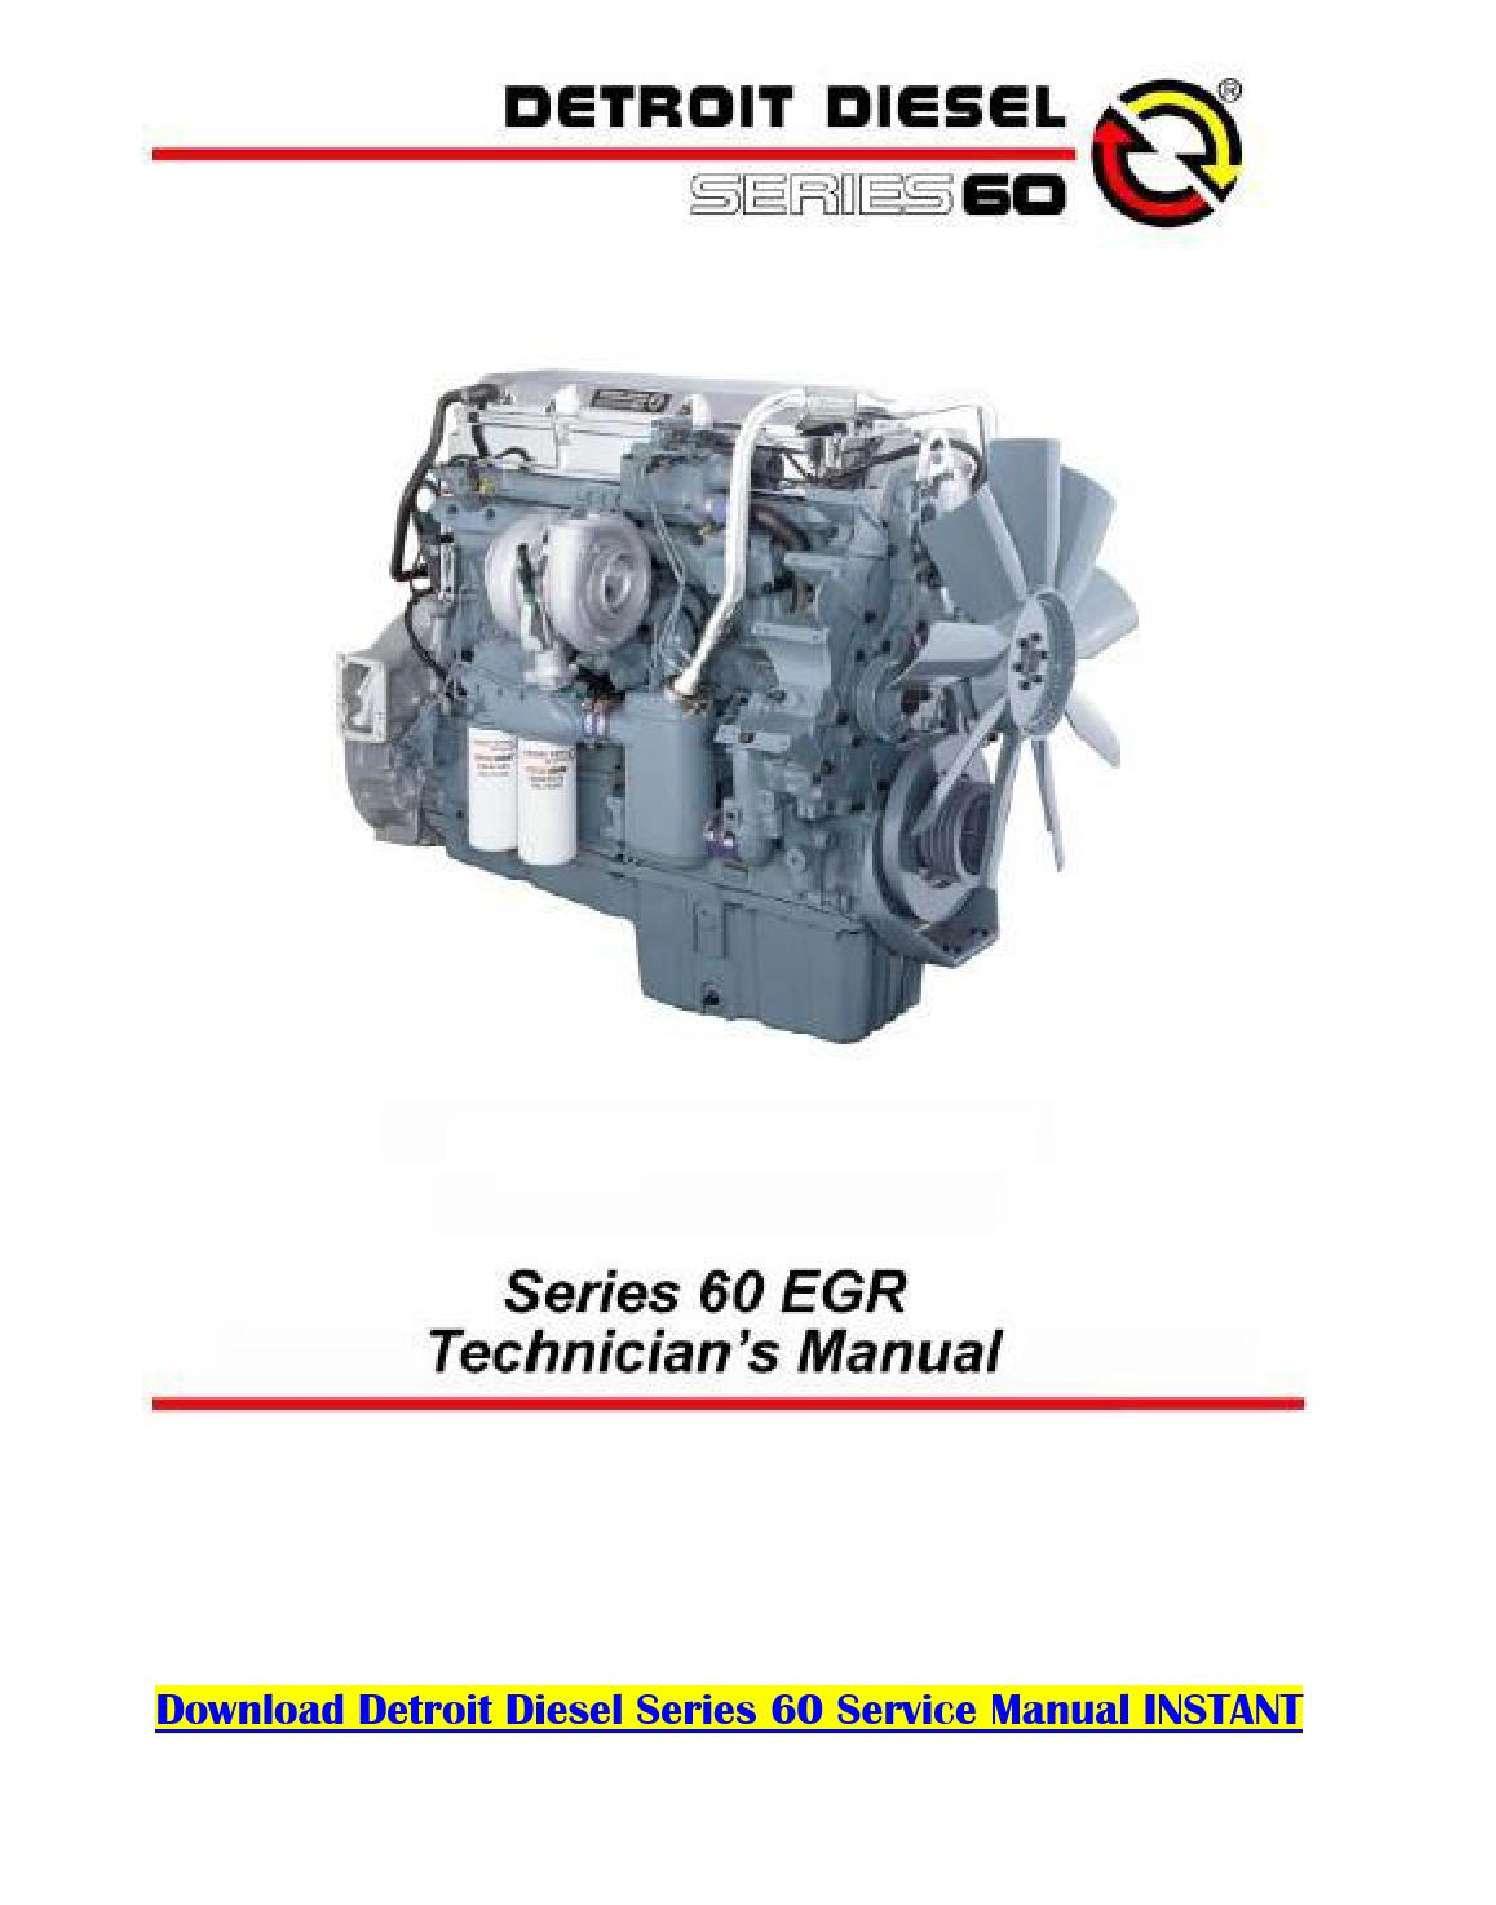 Detroit Diesel 60 Series Service Manual SS-01